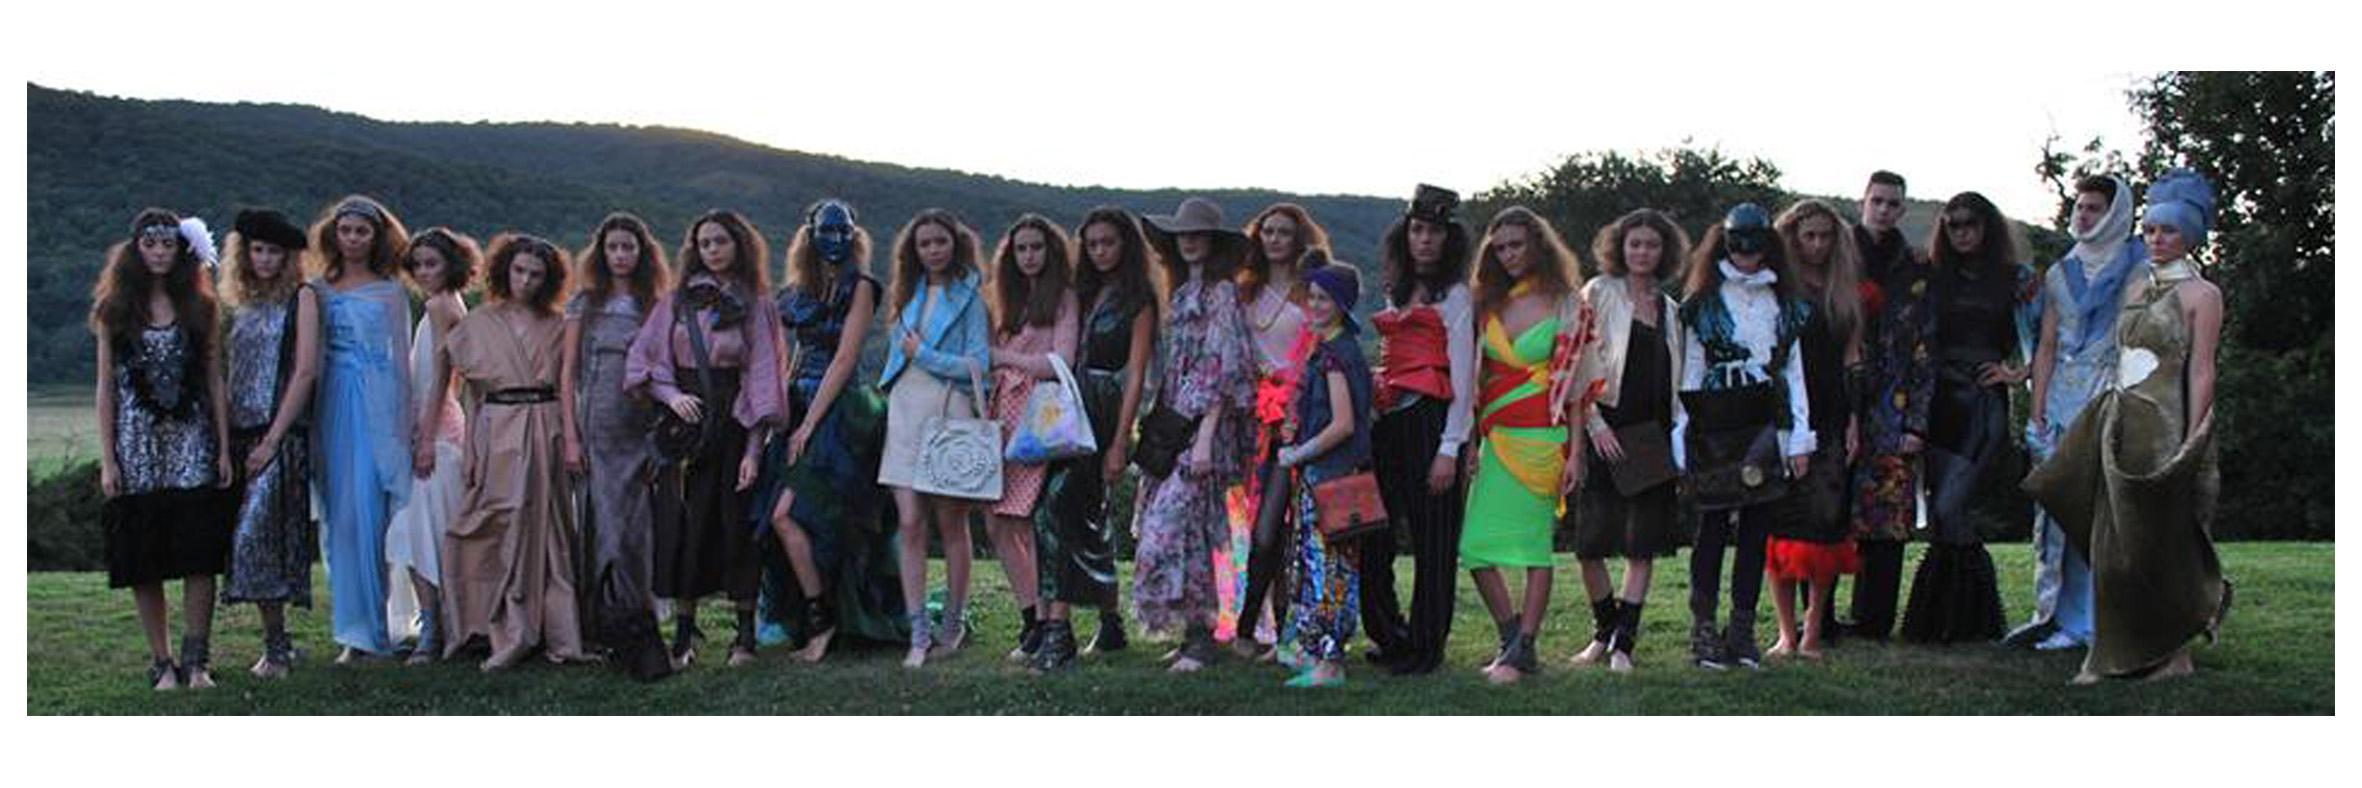 Timeless - Chic by Vali Cioban Fashion Show - Feeric Fashion Week 2017